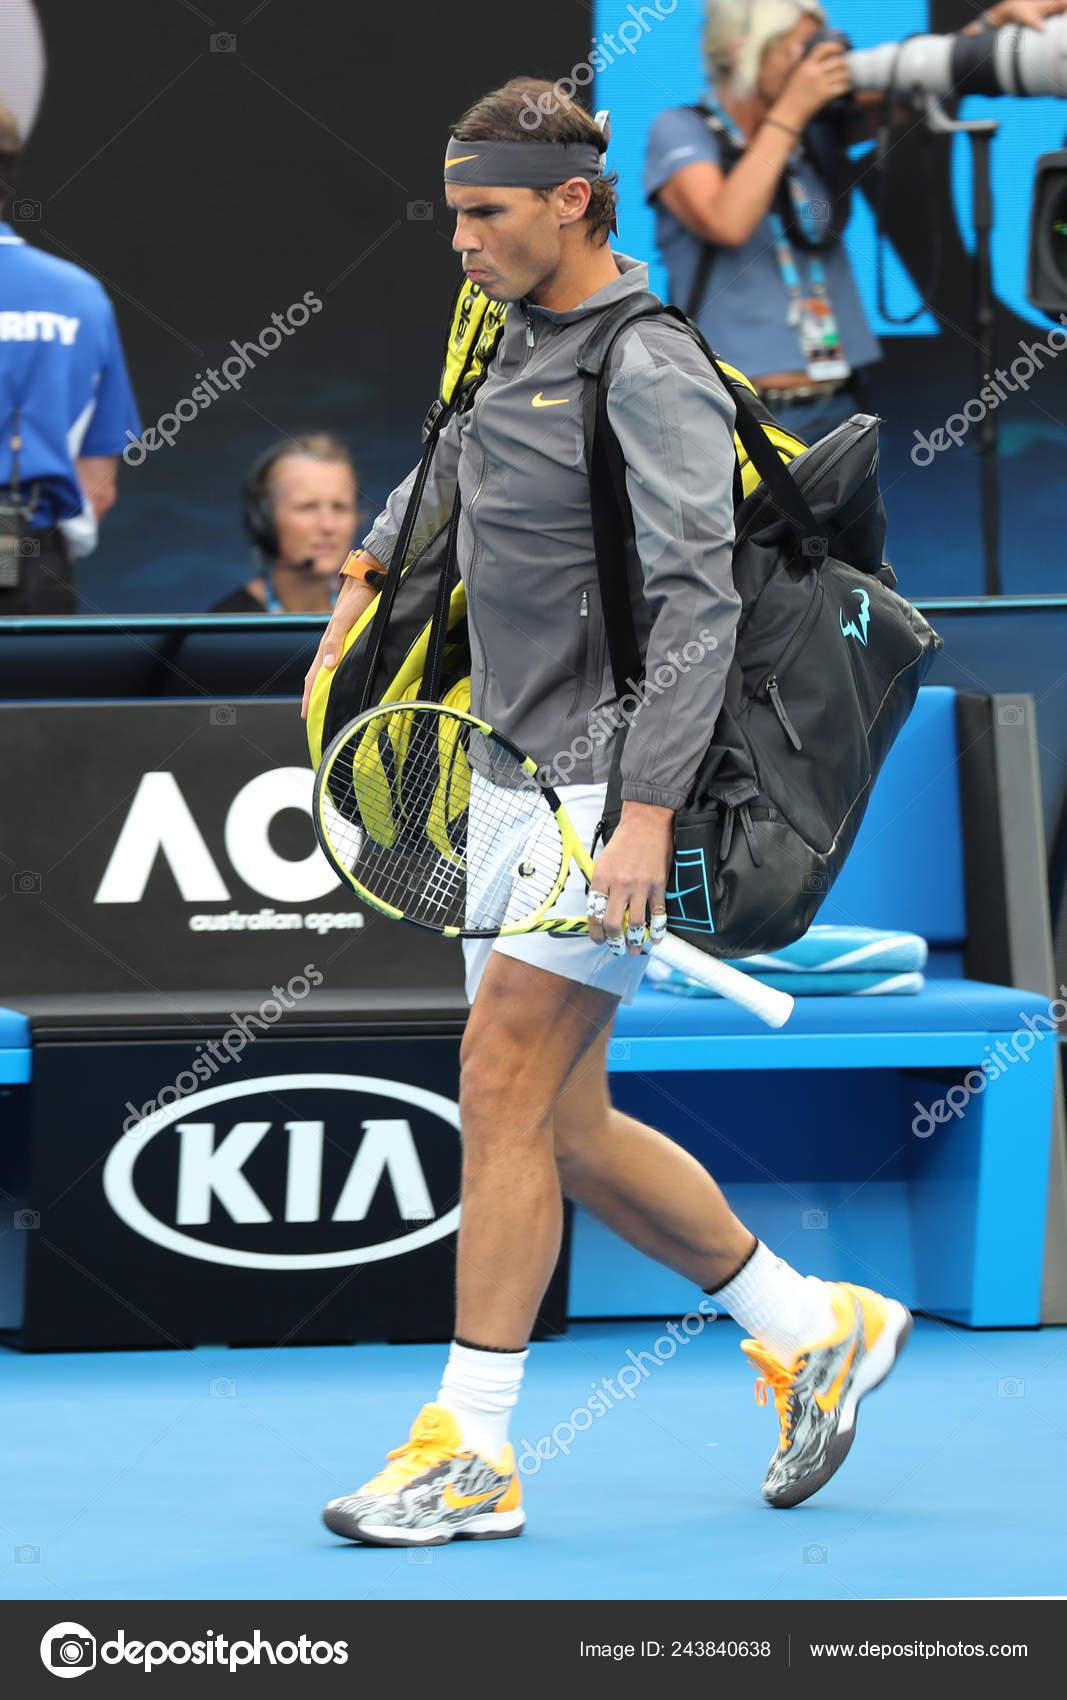 Melbourne Australia January 2019 2019 Australian Open Finalist Rafael Nadal Stock Editorial Photo C Zhukovsky 243840638